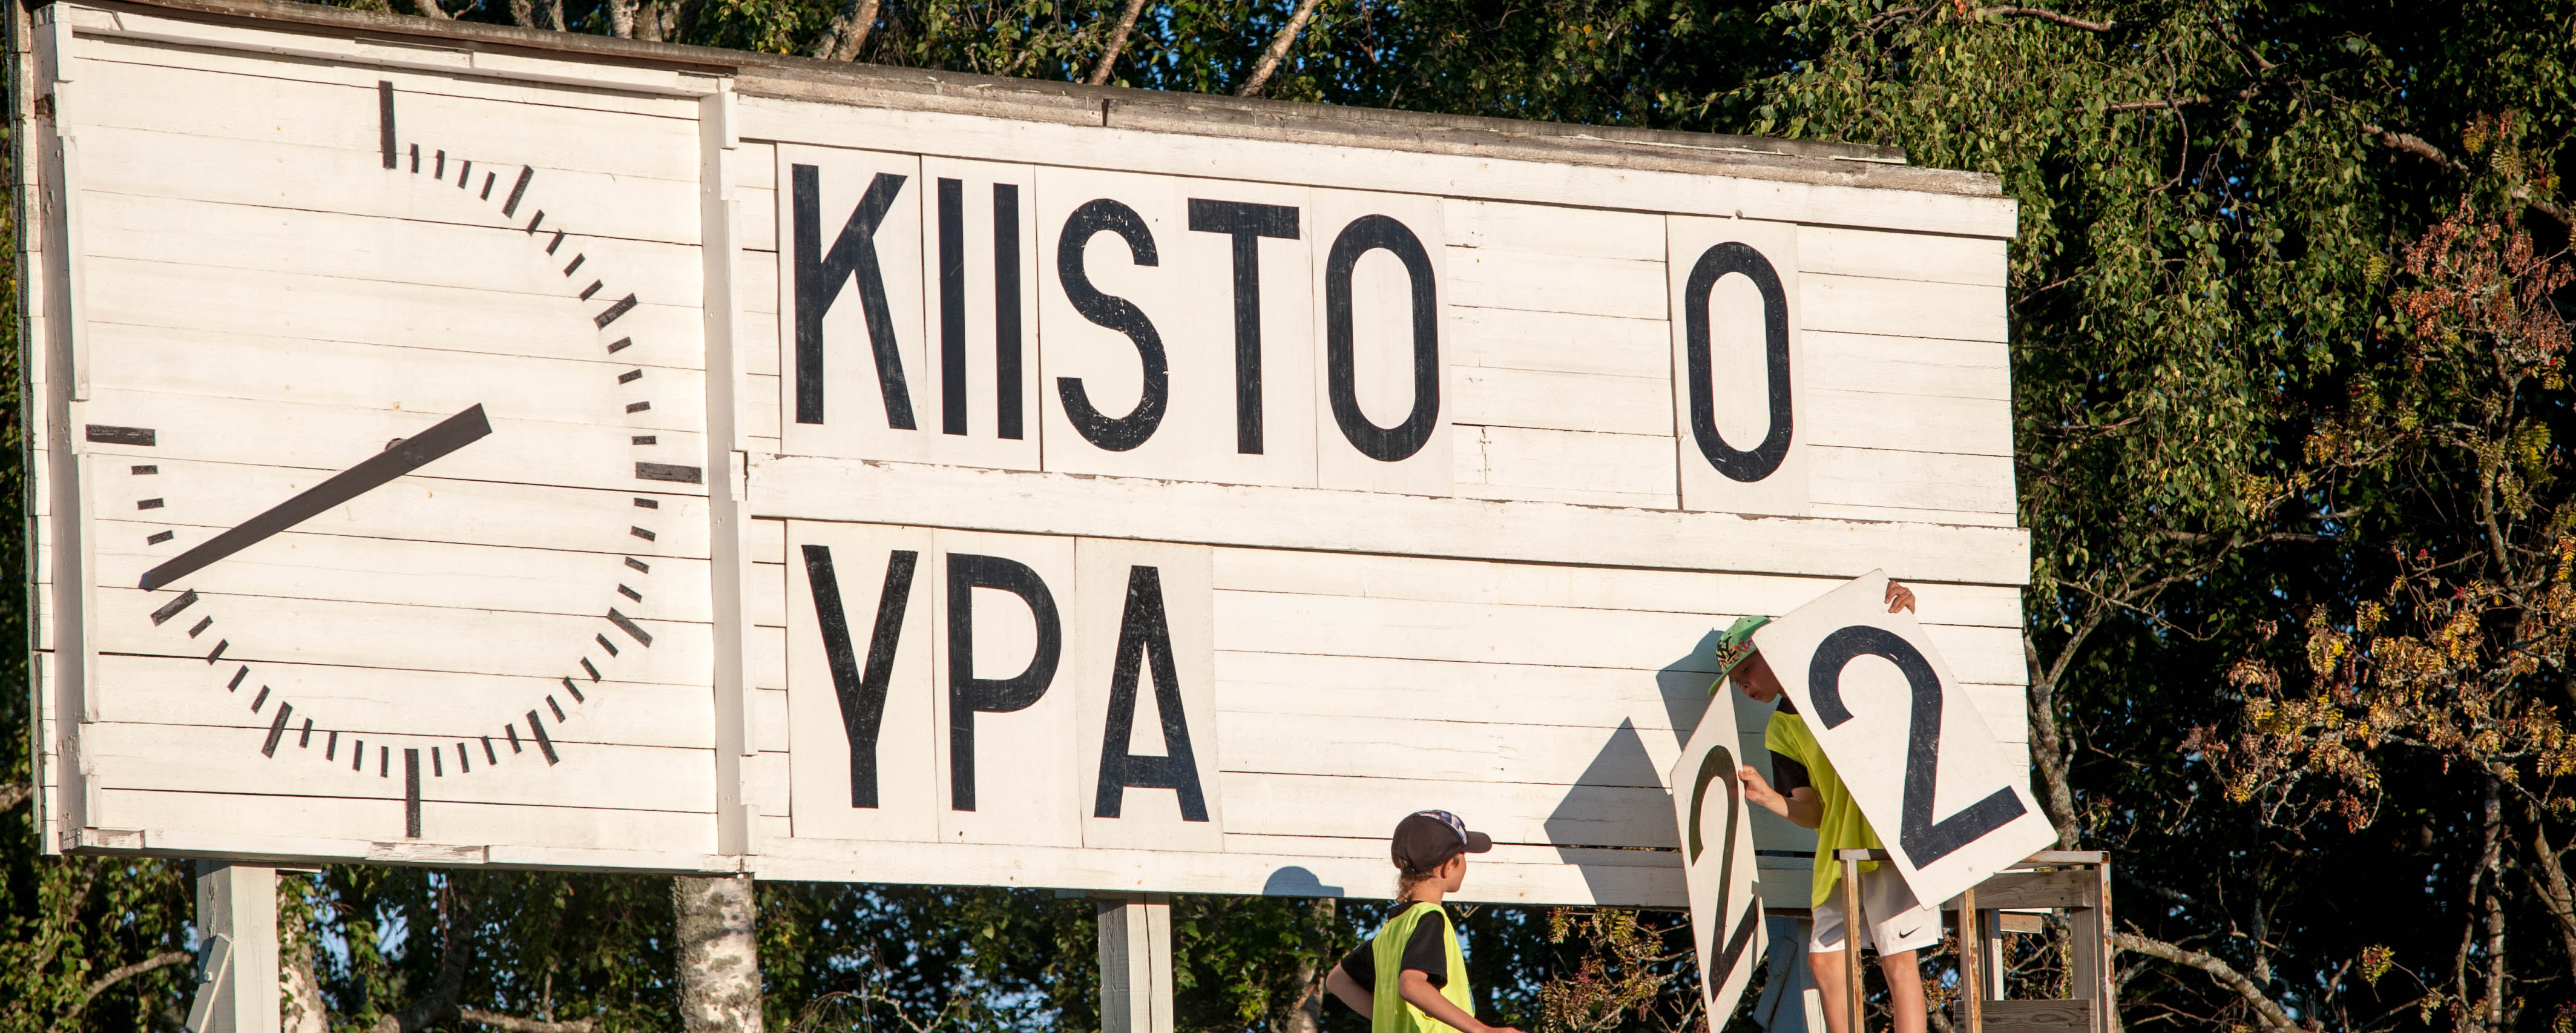 FC Kiisto Vaasa - FC YPA Ylivieska 1:3 (0:2)